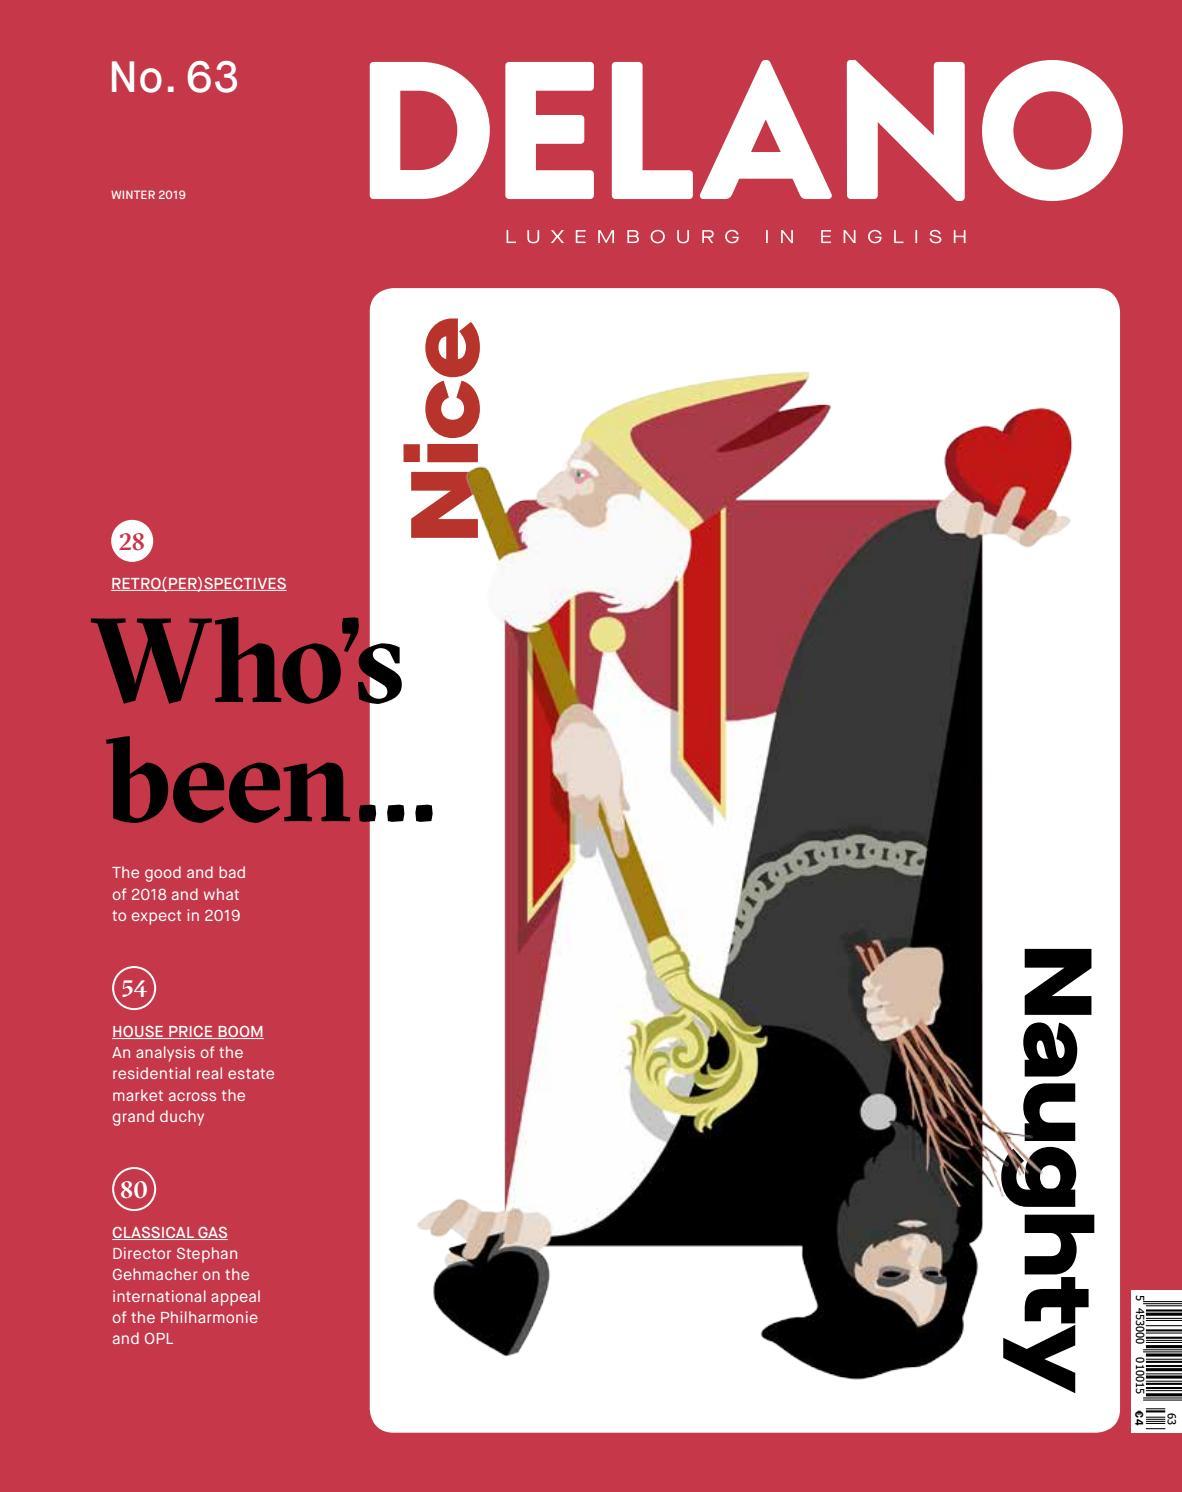 Delano winter 2019 by Maison Moderne - issuu